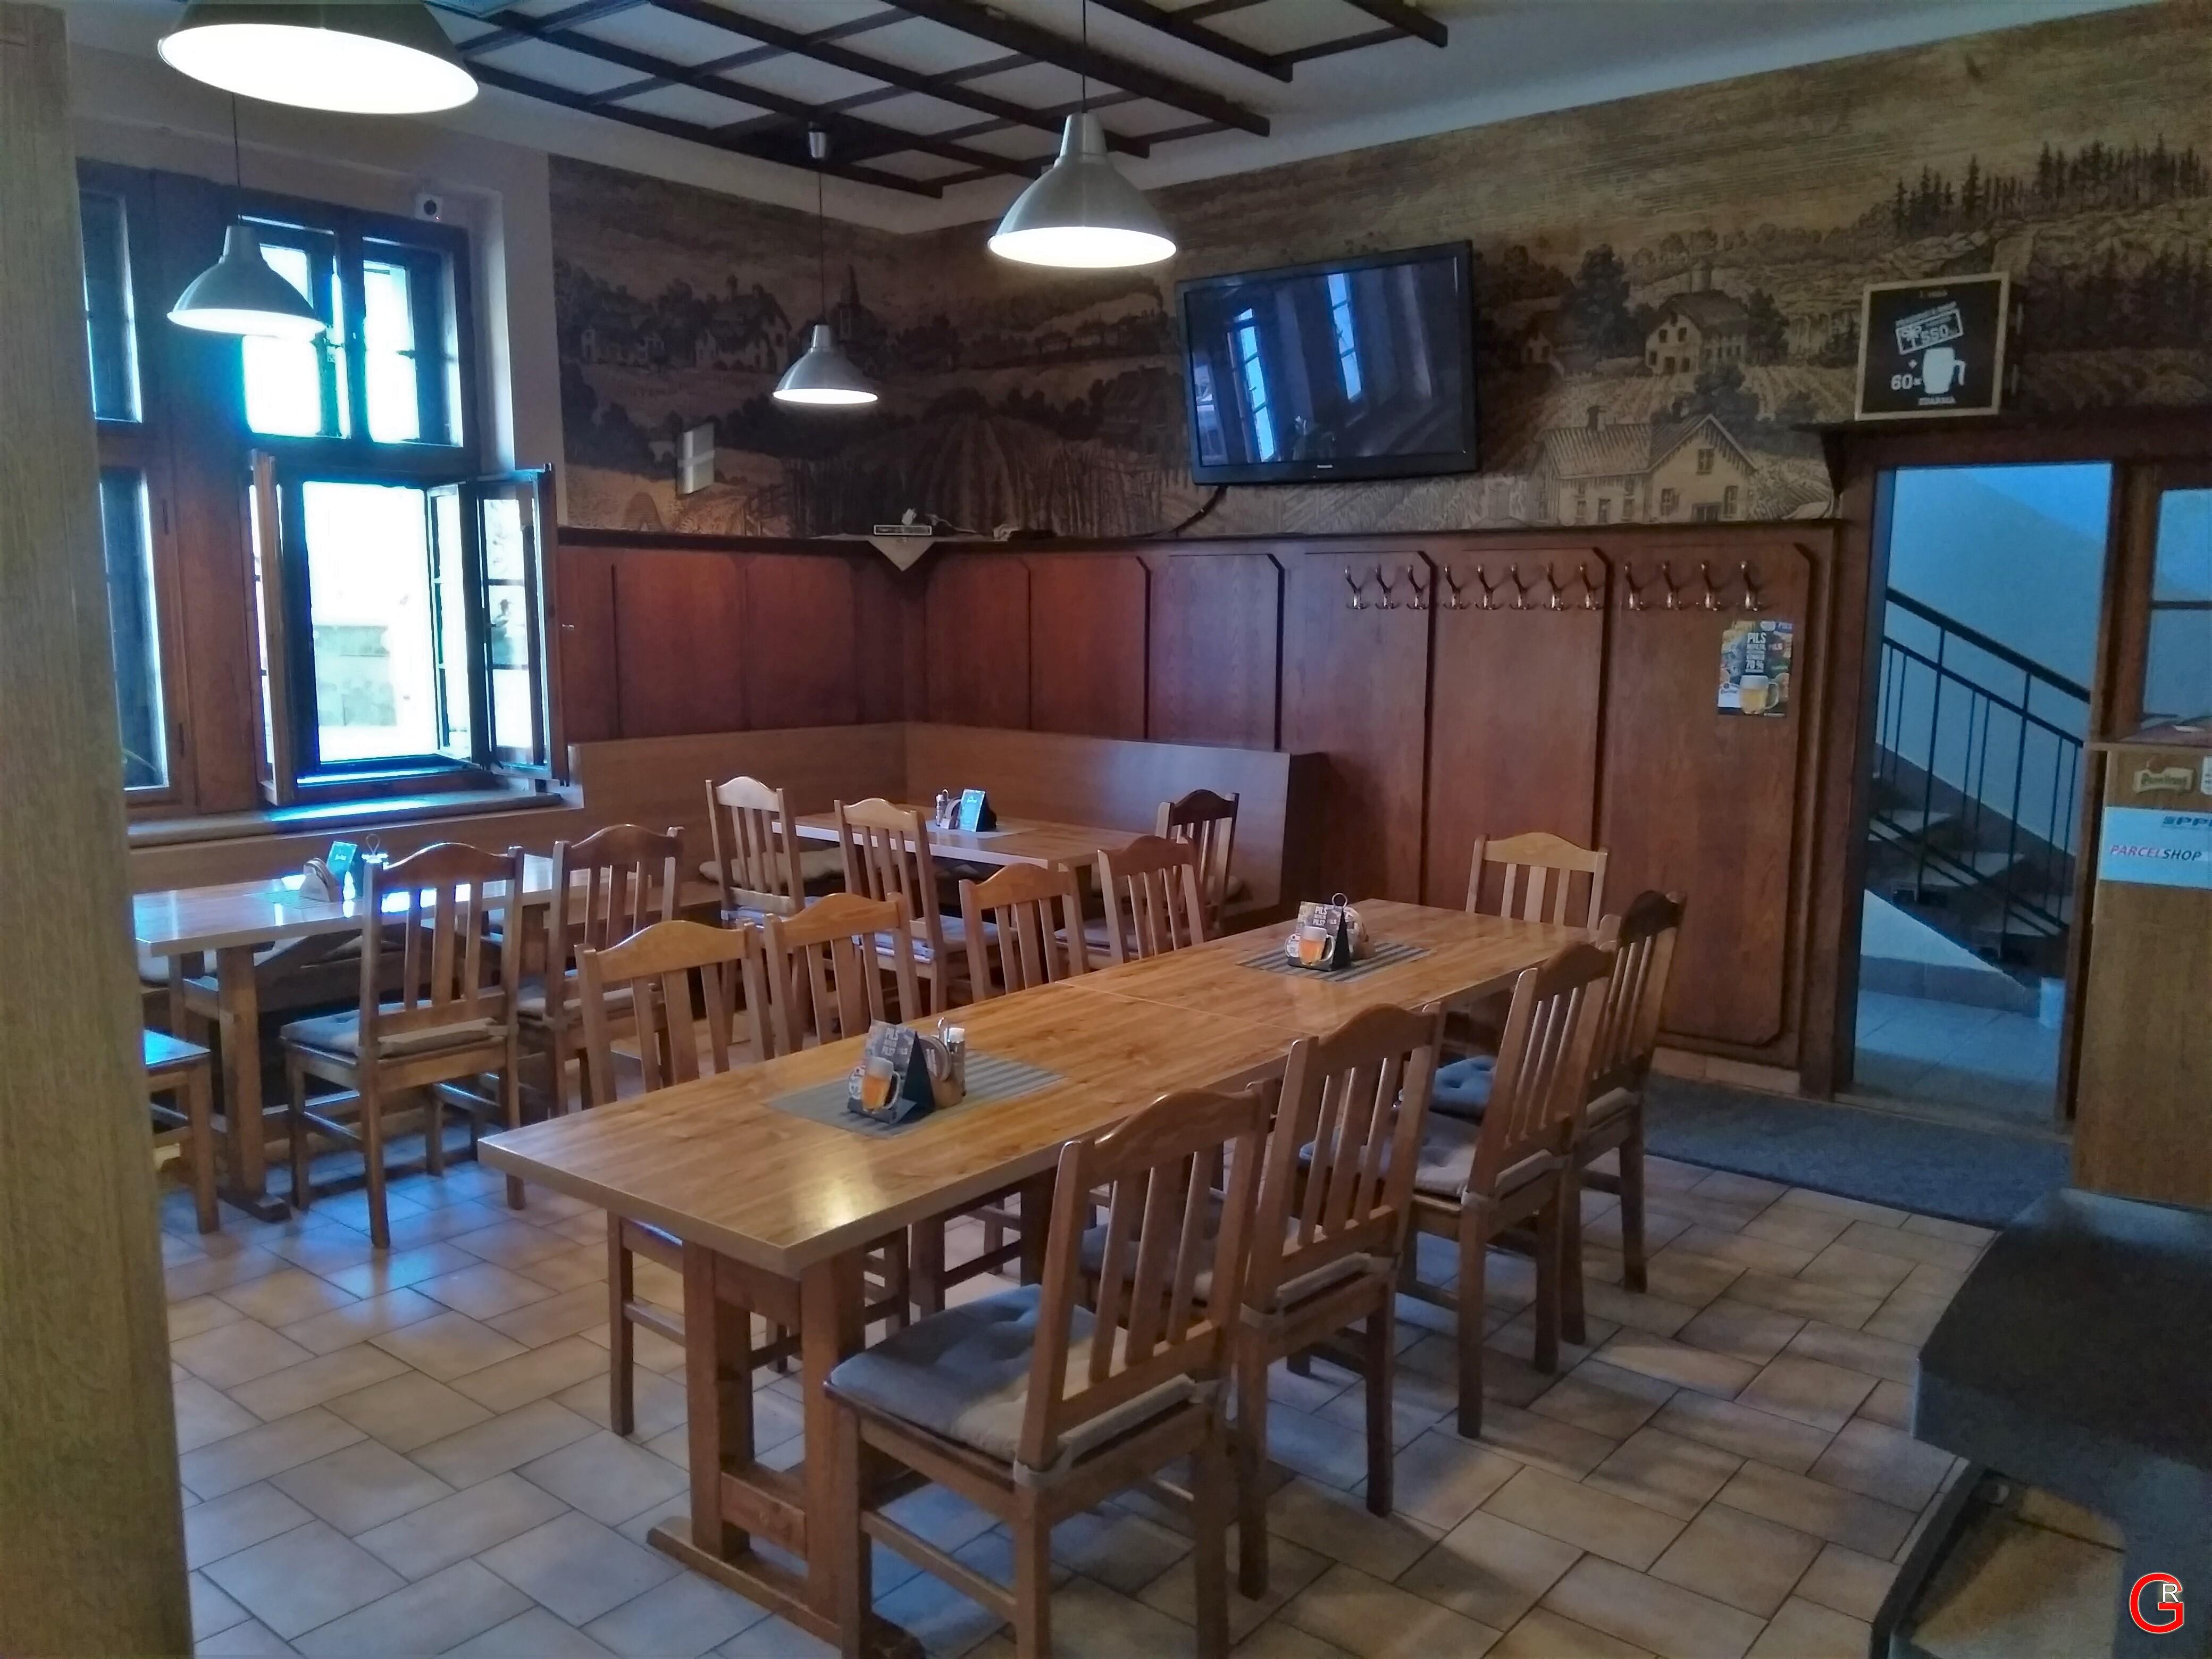 Restaurace u Sokola, interiér 2